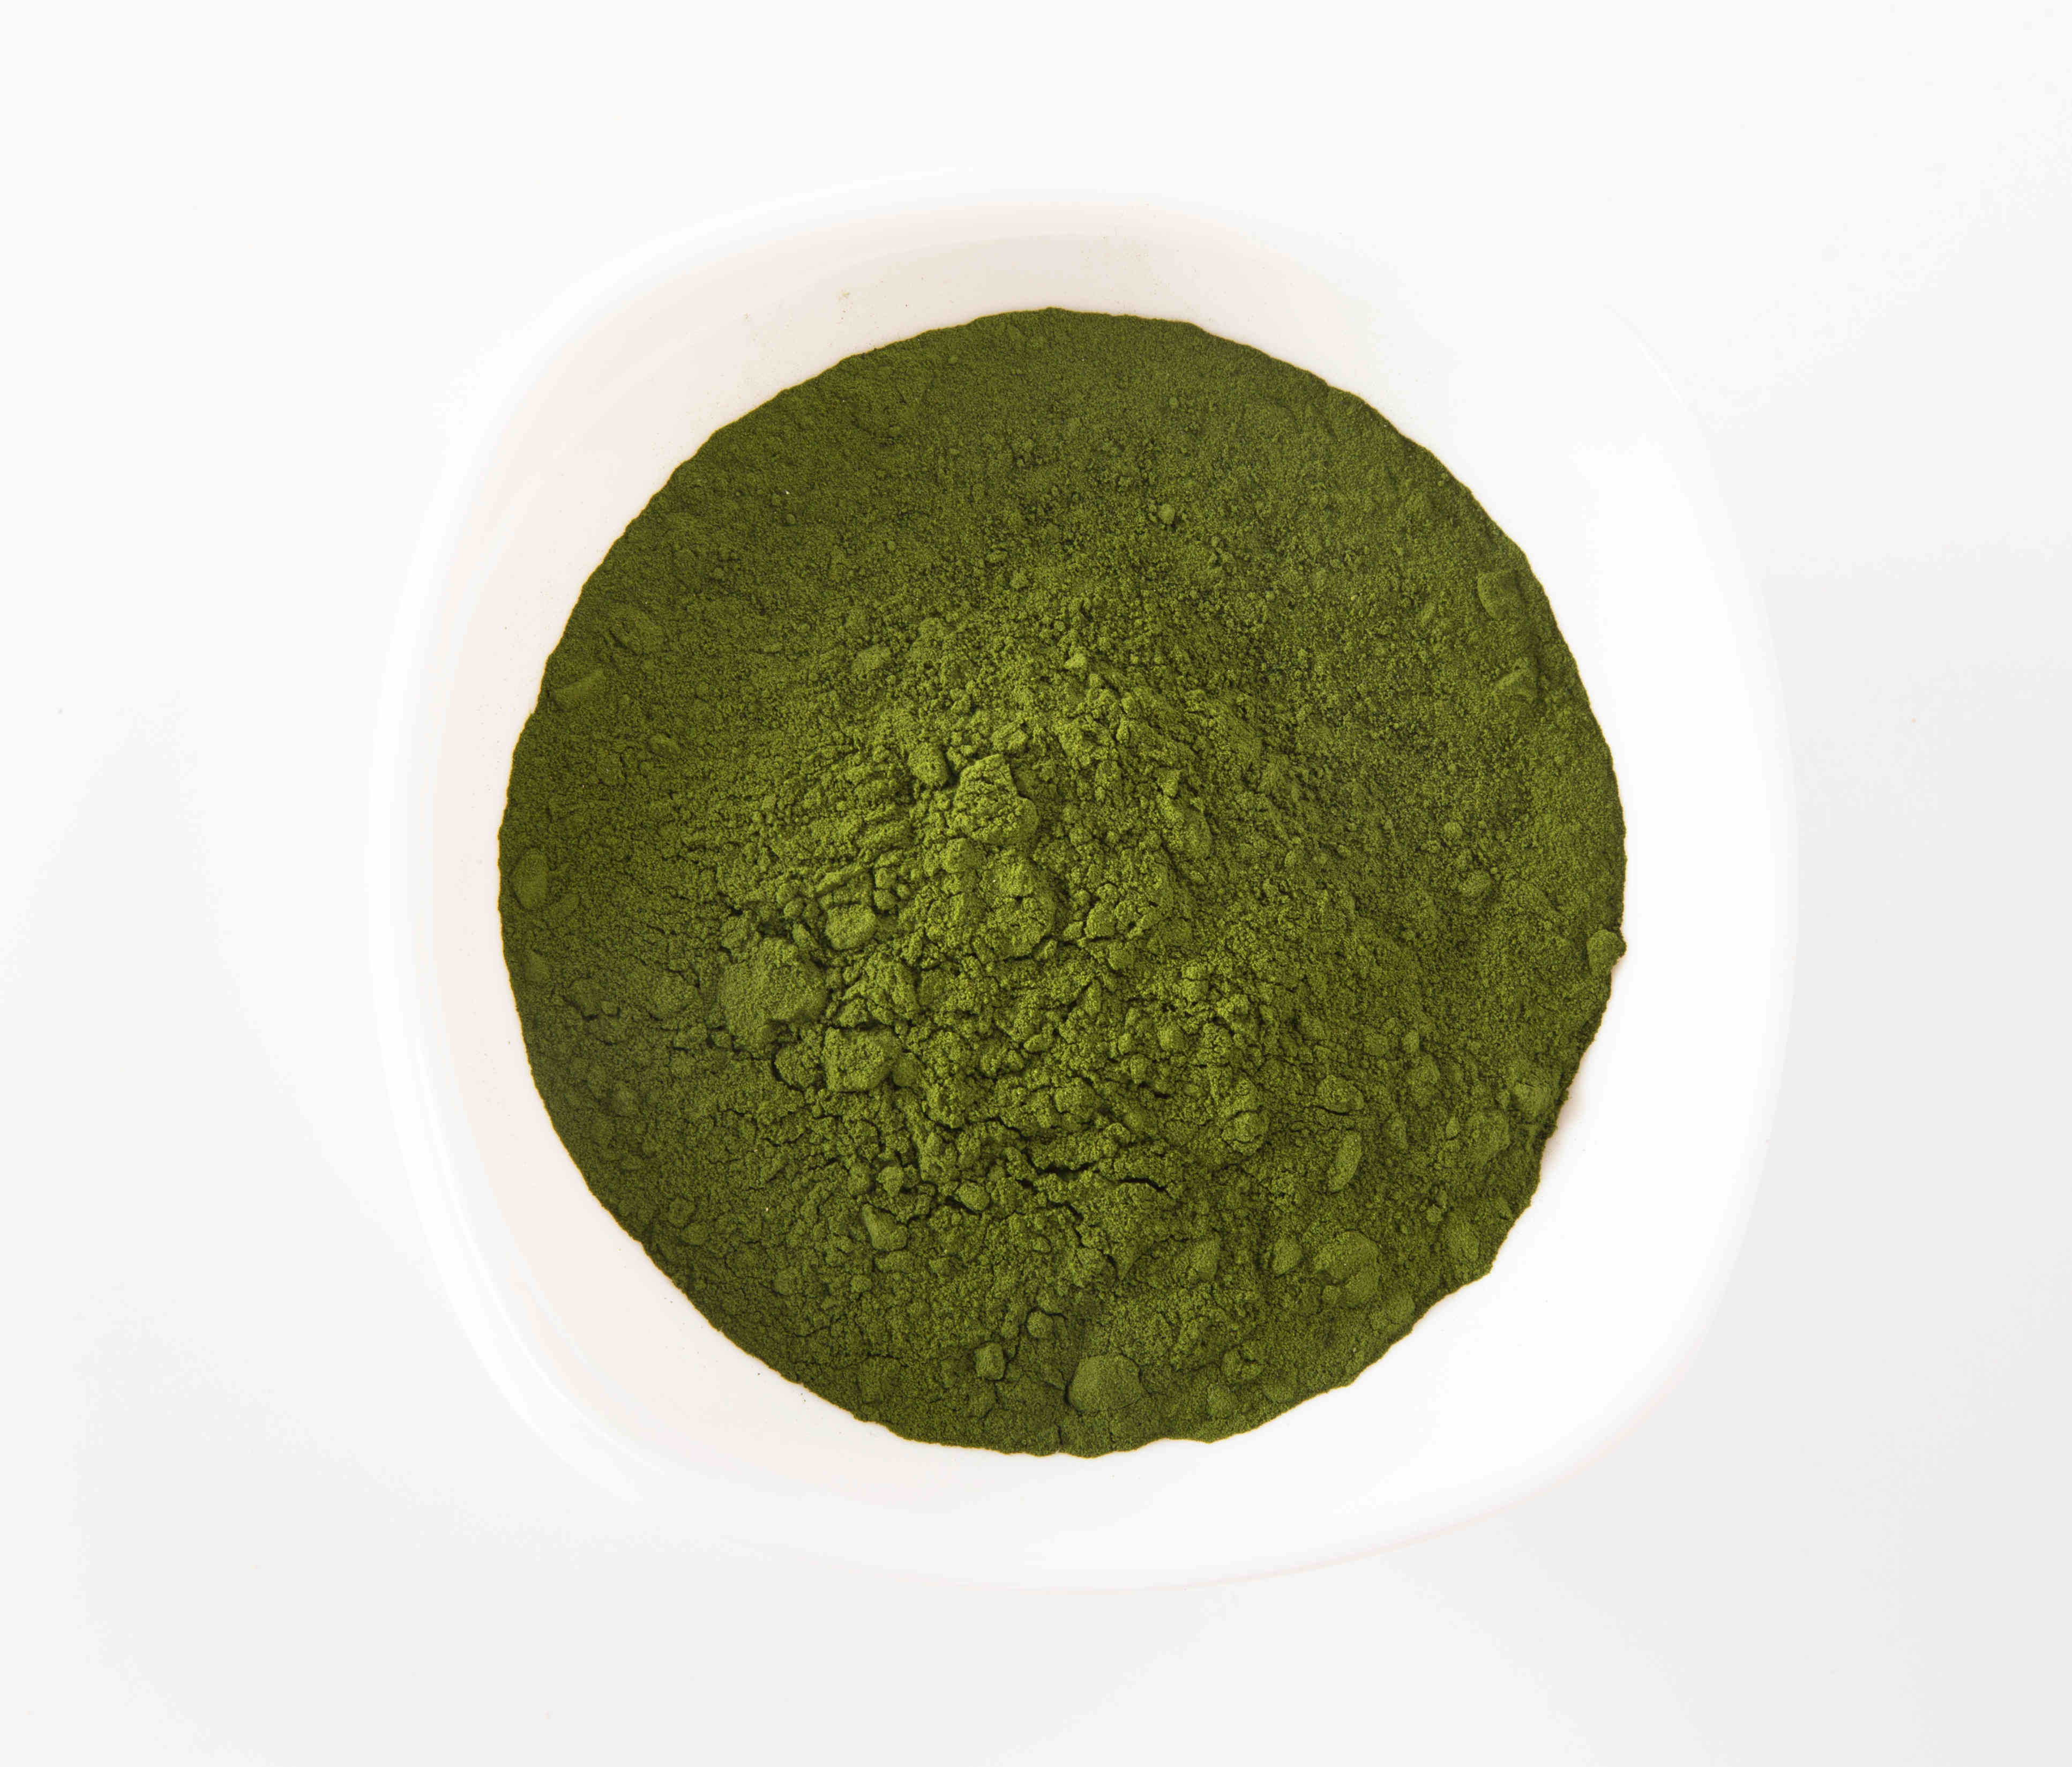 Professional manufacturer 100% organic matcha green tea powder - 4uTea | 4uTea.com